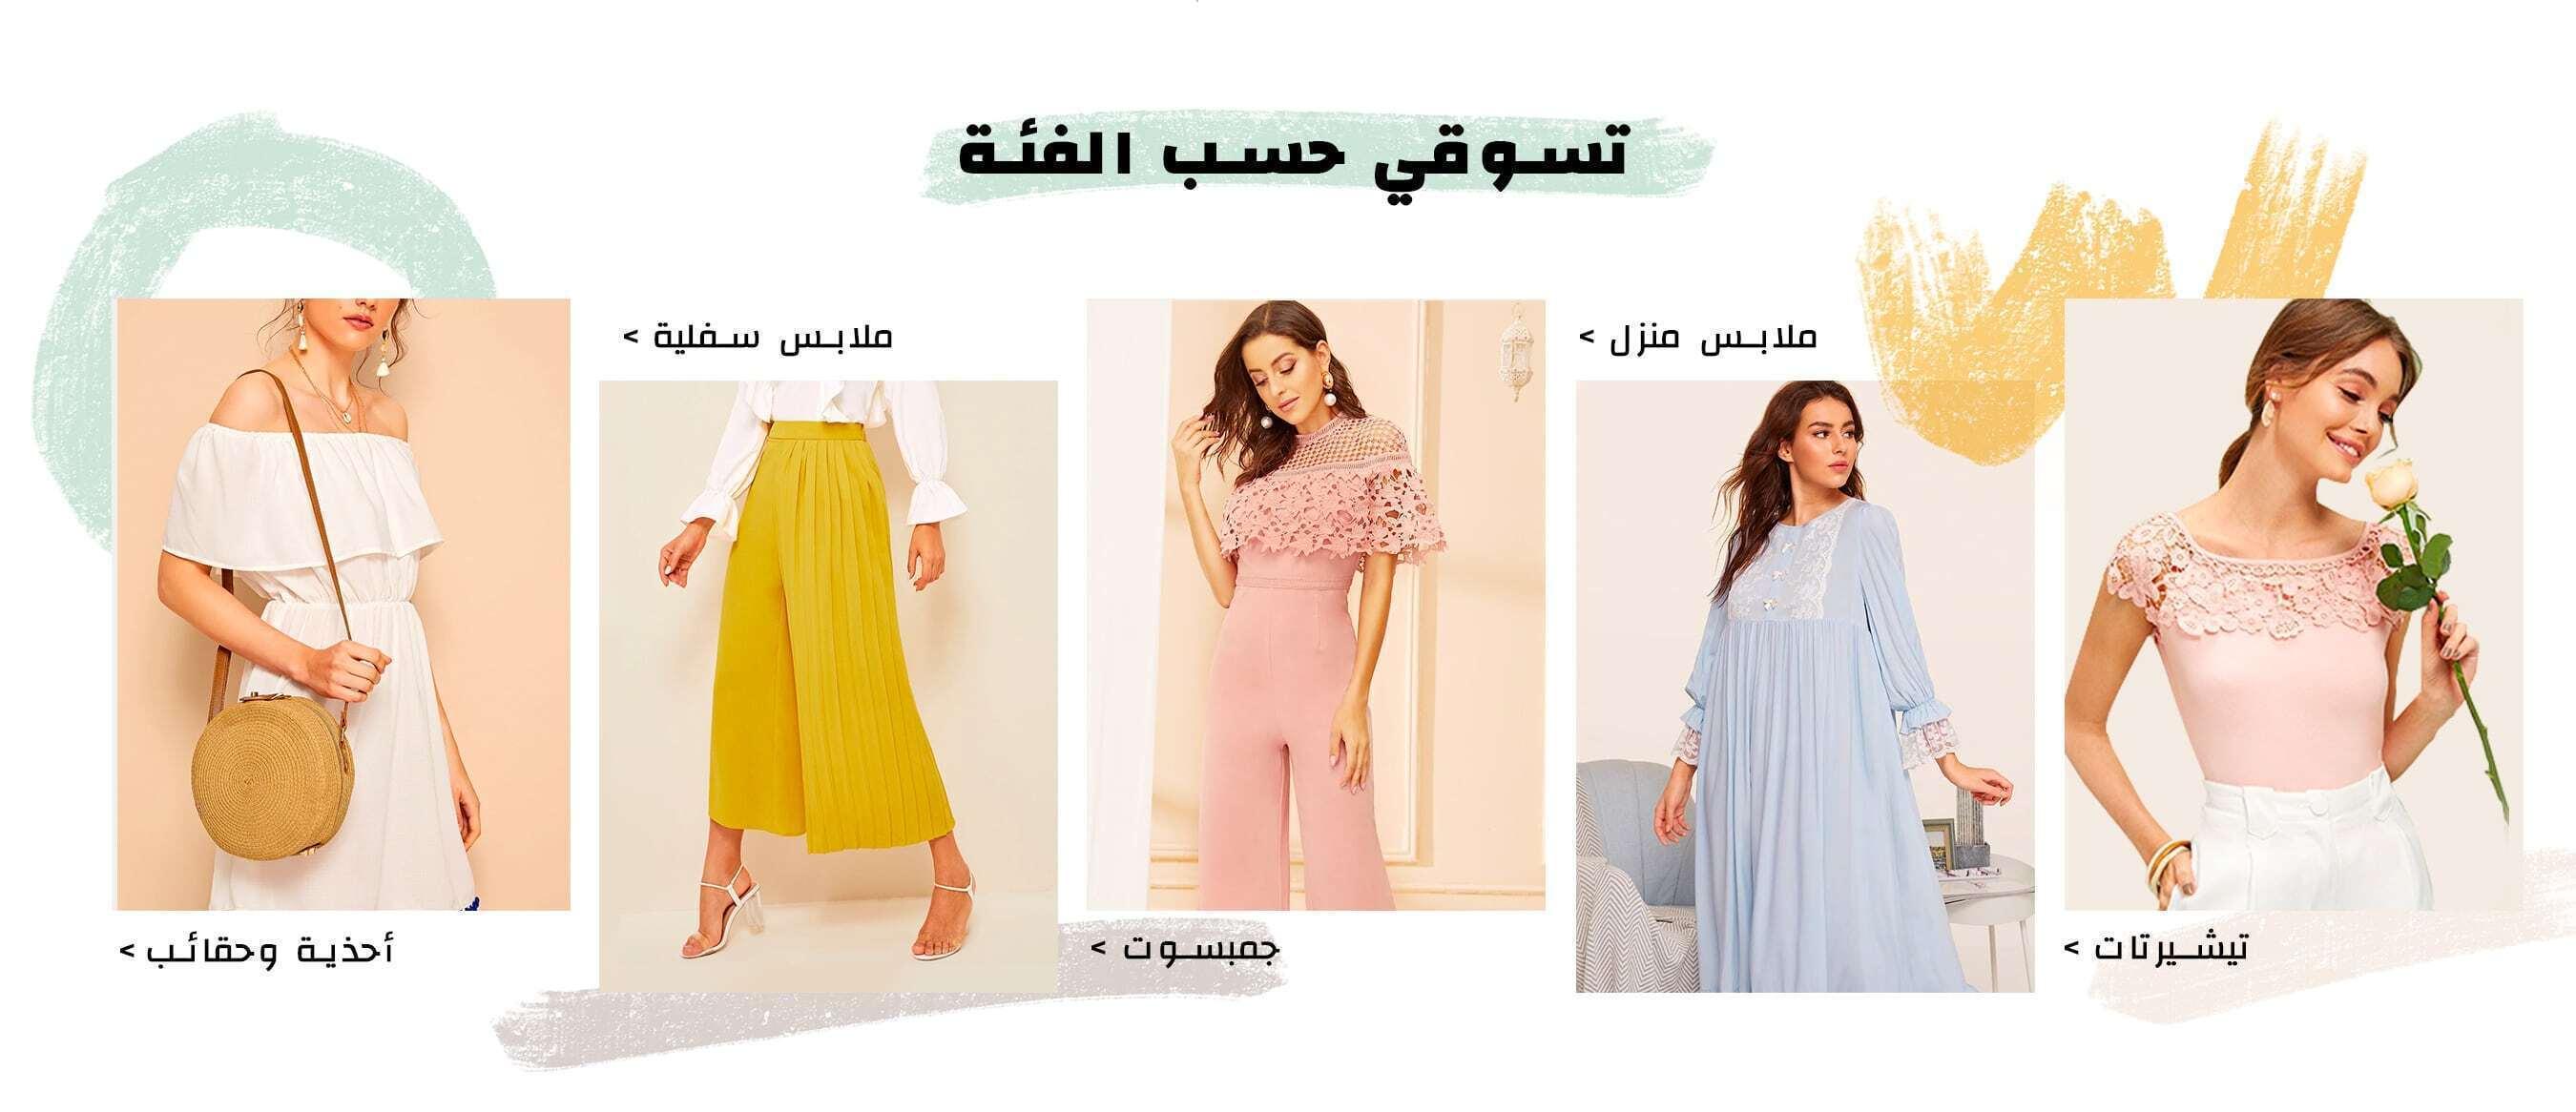 ecb0e3d46 شي إن | موضة نساء على الإنترنت | تسوقوا الفساتين، والأحذية والحقائب